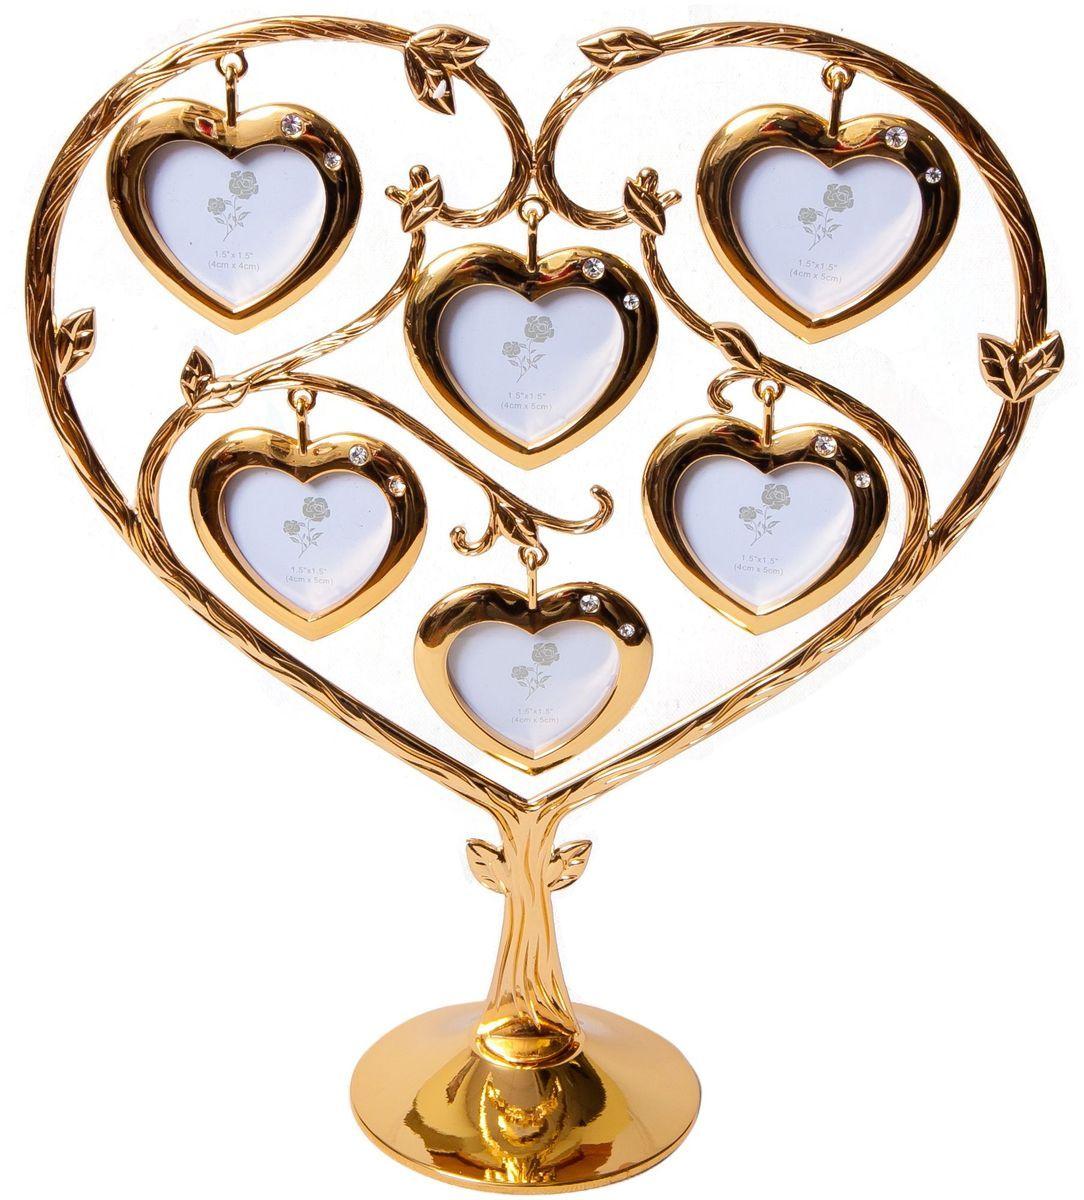 Фоторамка декоративная Platinum Дерево. Сердца, на 6 фото, высота 25,5 см. PF9902SG6 фоторамок на дереве PF9902SG GOLDРодословное дерево в виде сердца, с фото 4x5 см.